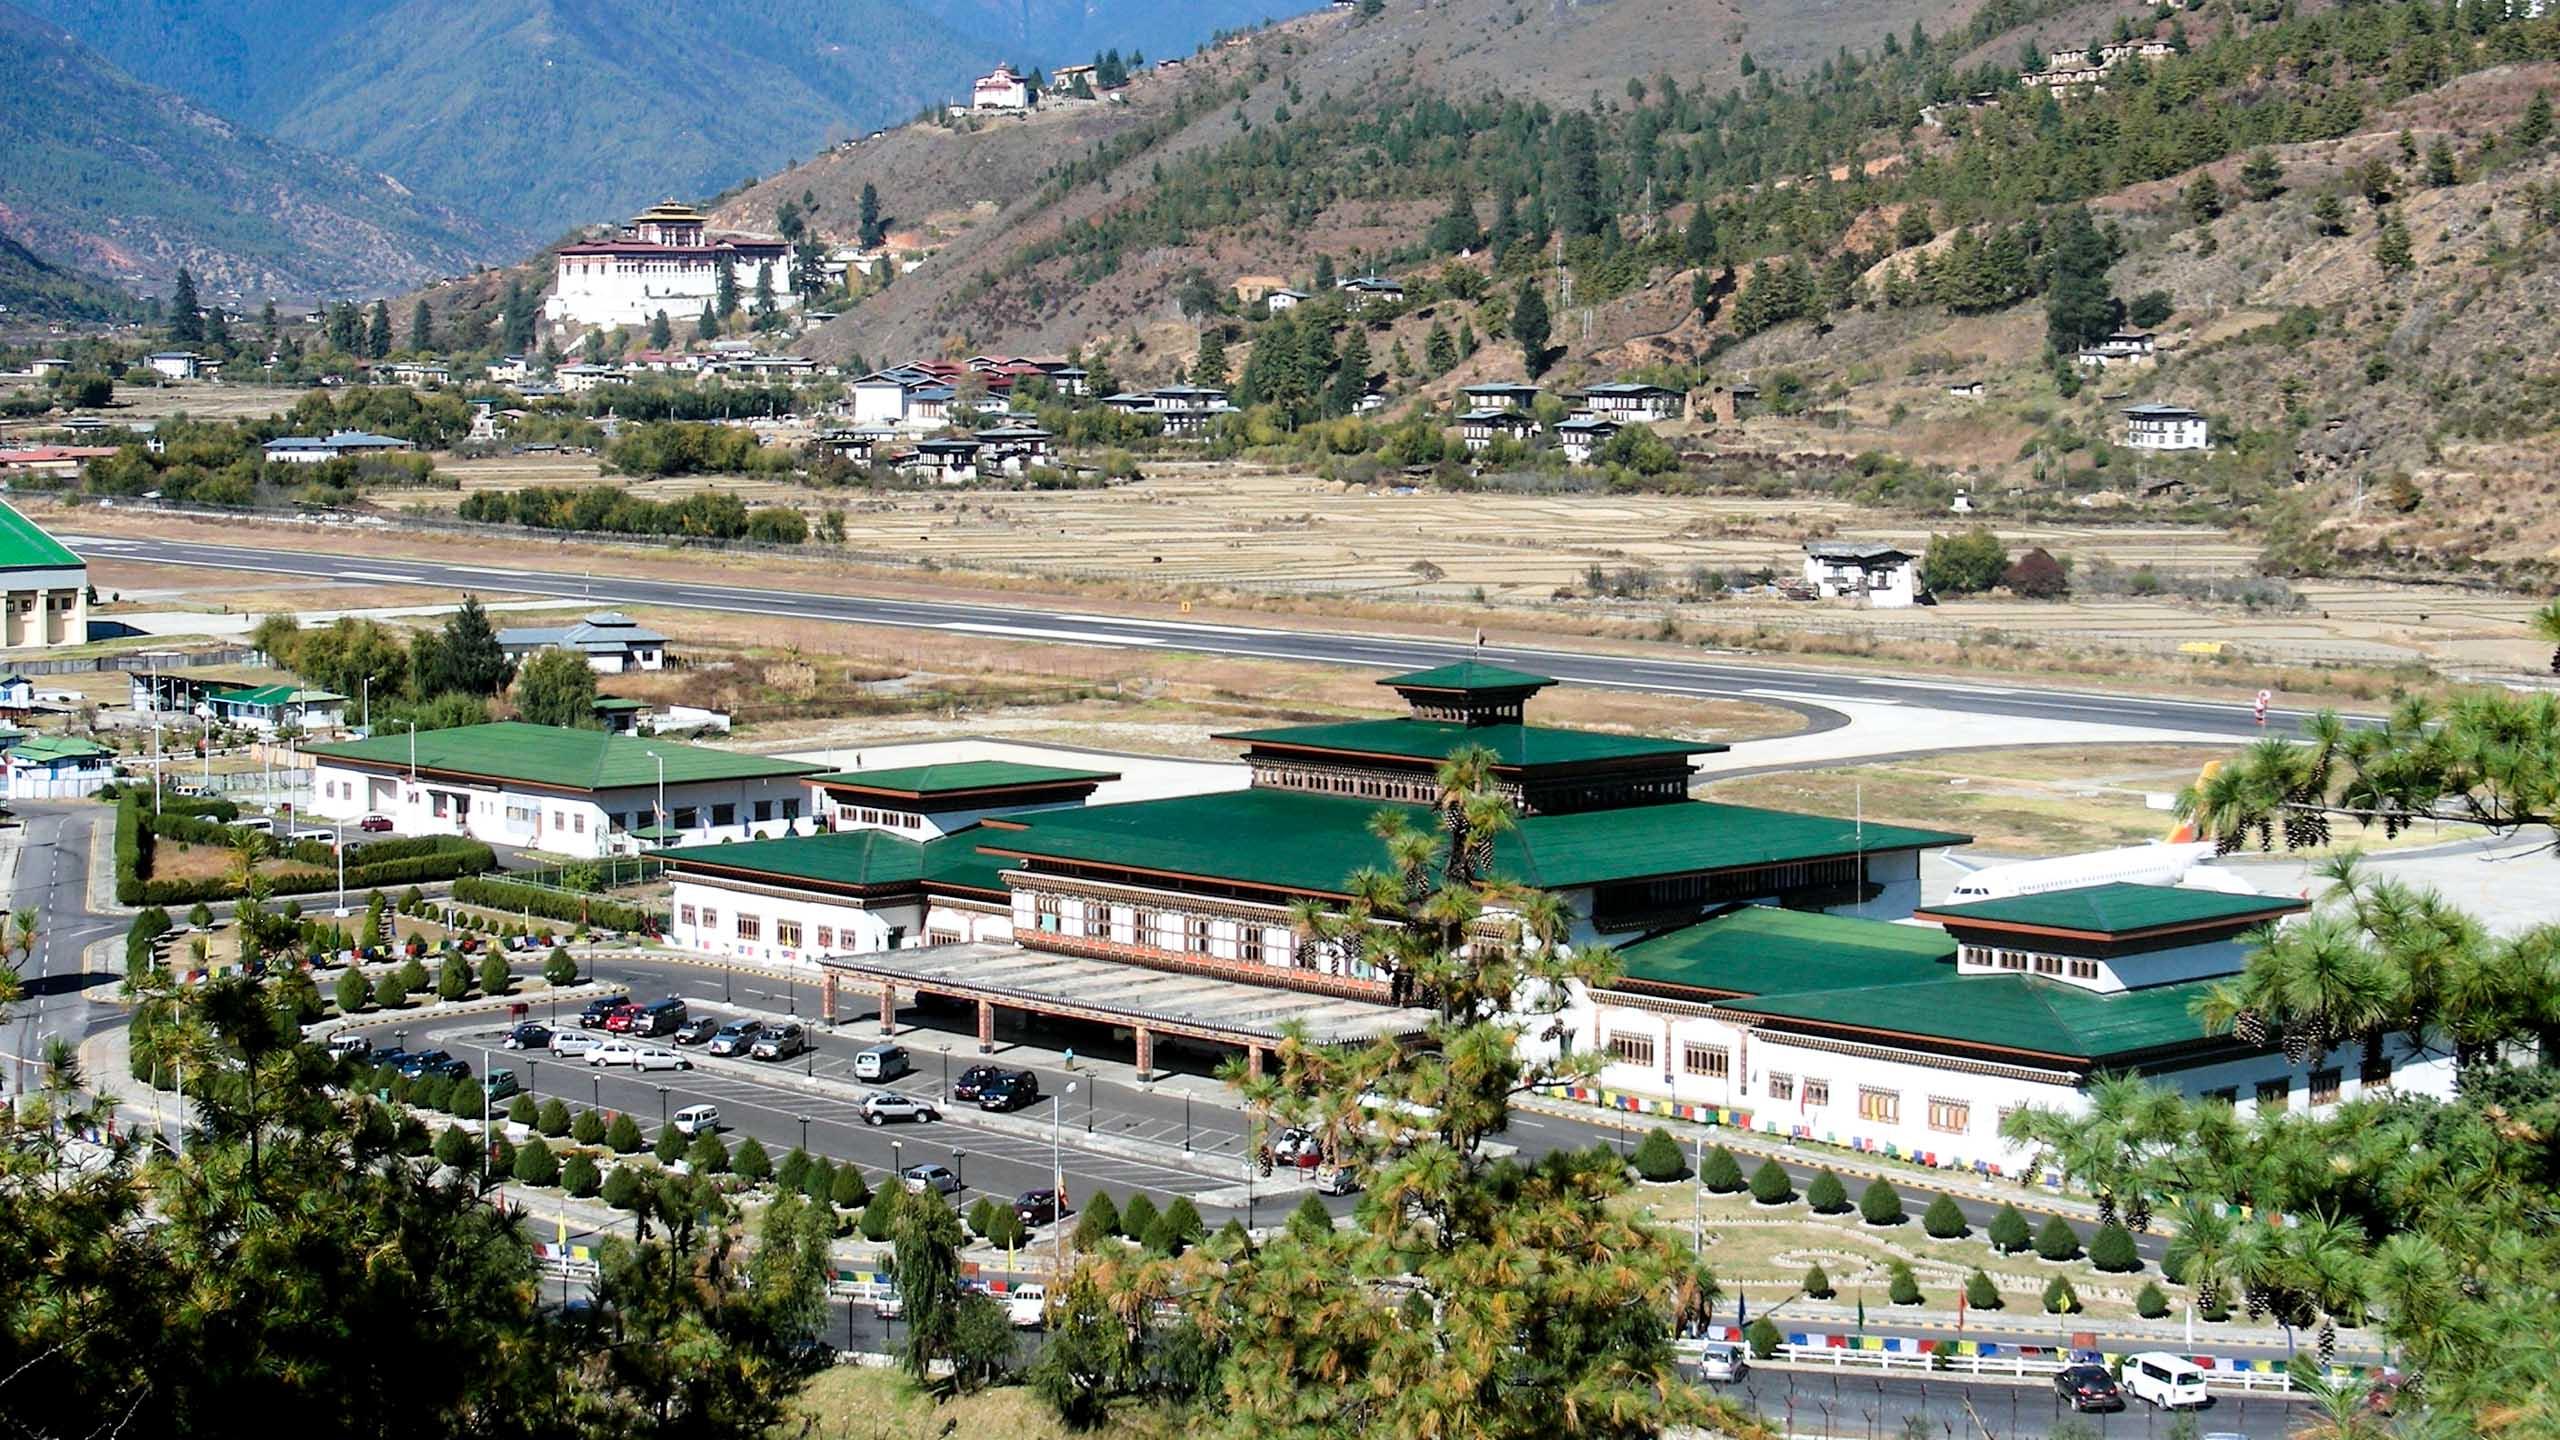 Bhutan valley town